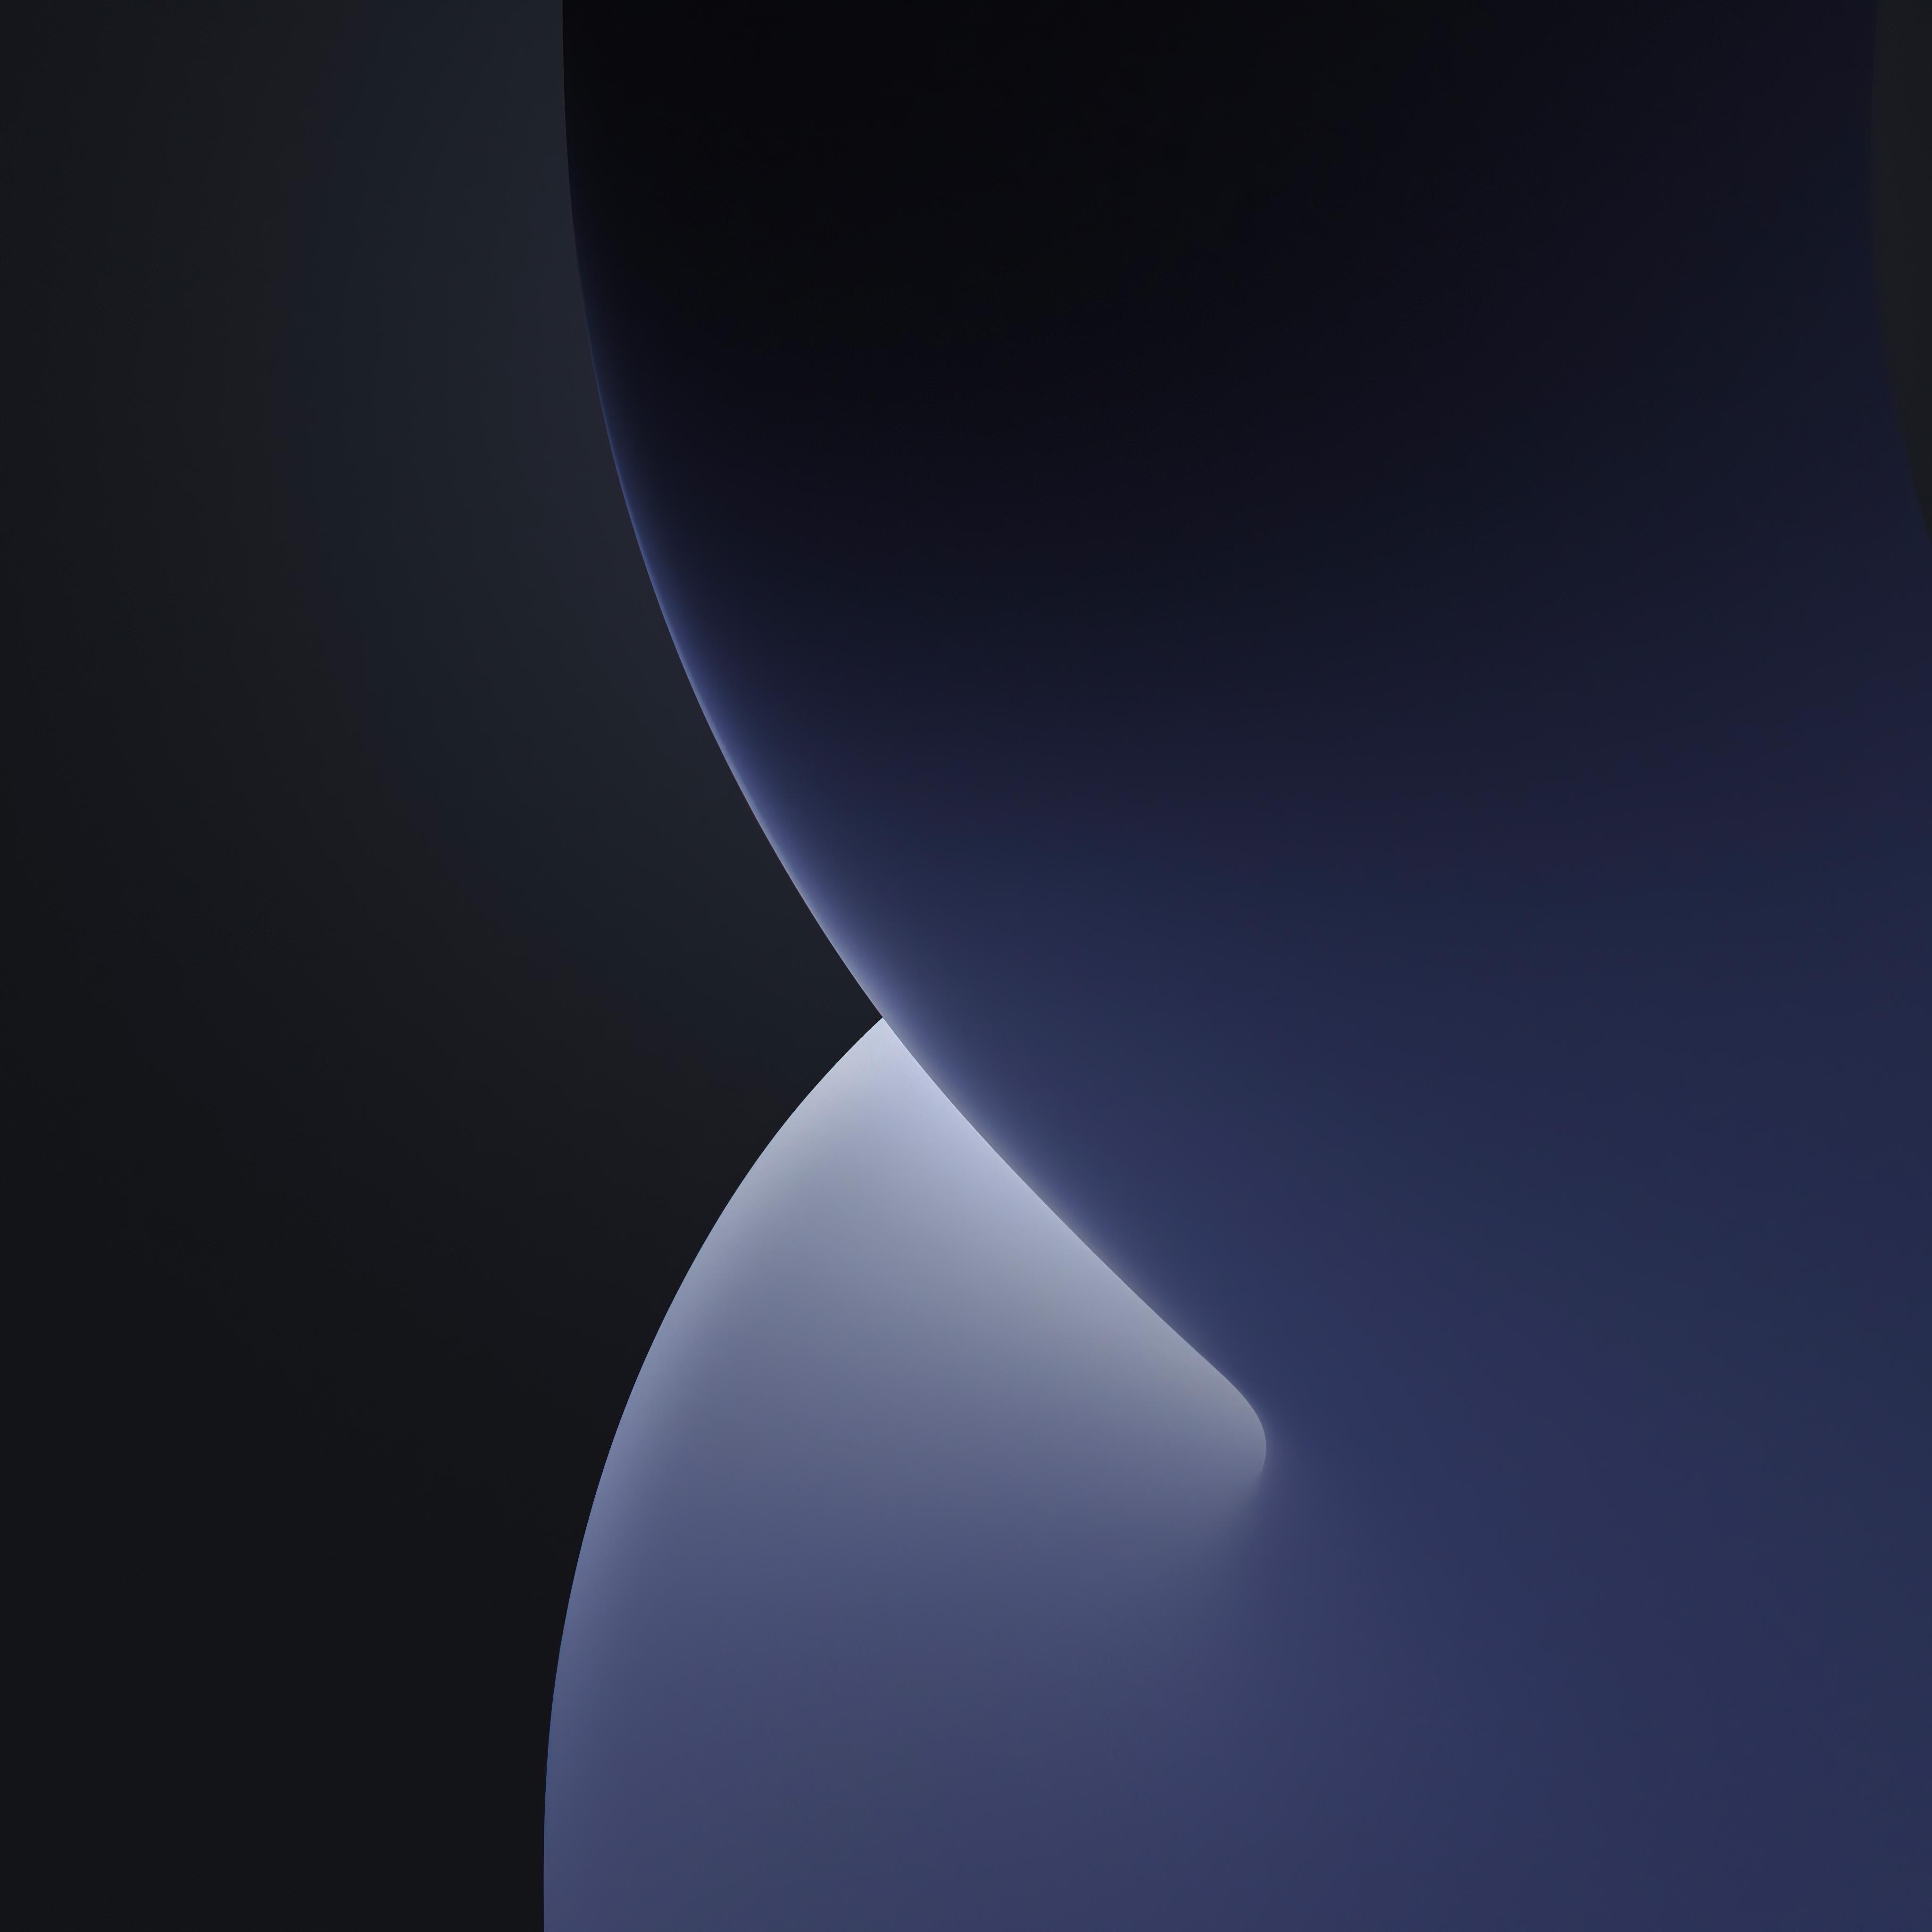 Ios 14 4k Wallpaper Wwdc 2020 Iphone 12 Ipados Dark Grey Stock Black Dark 1447